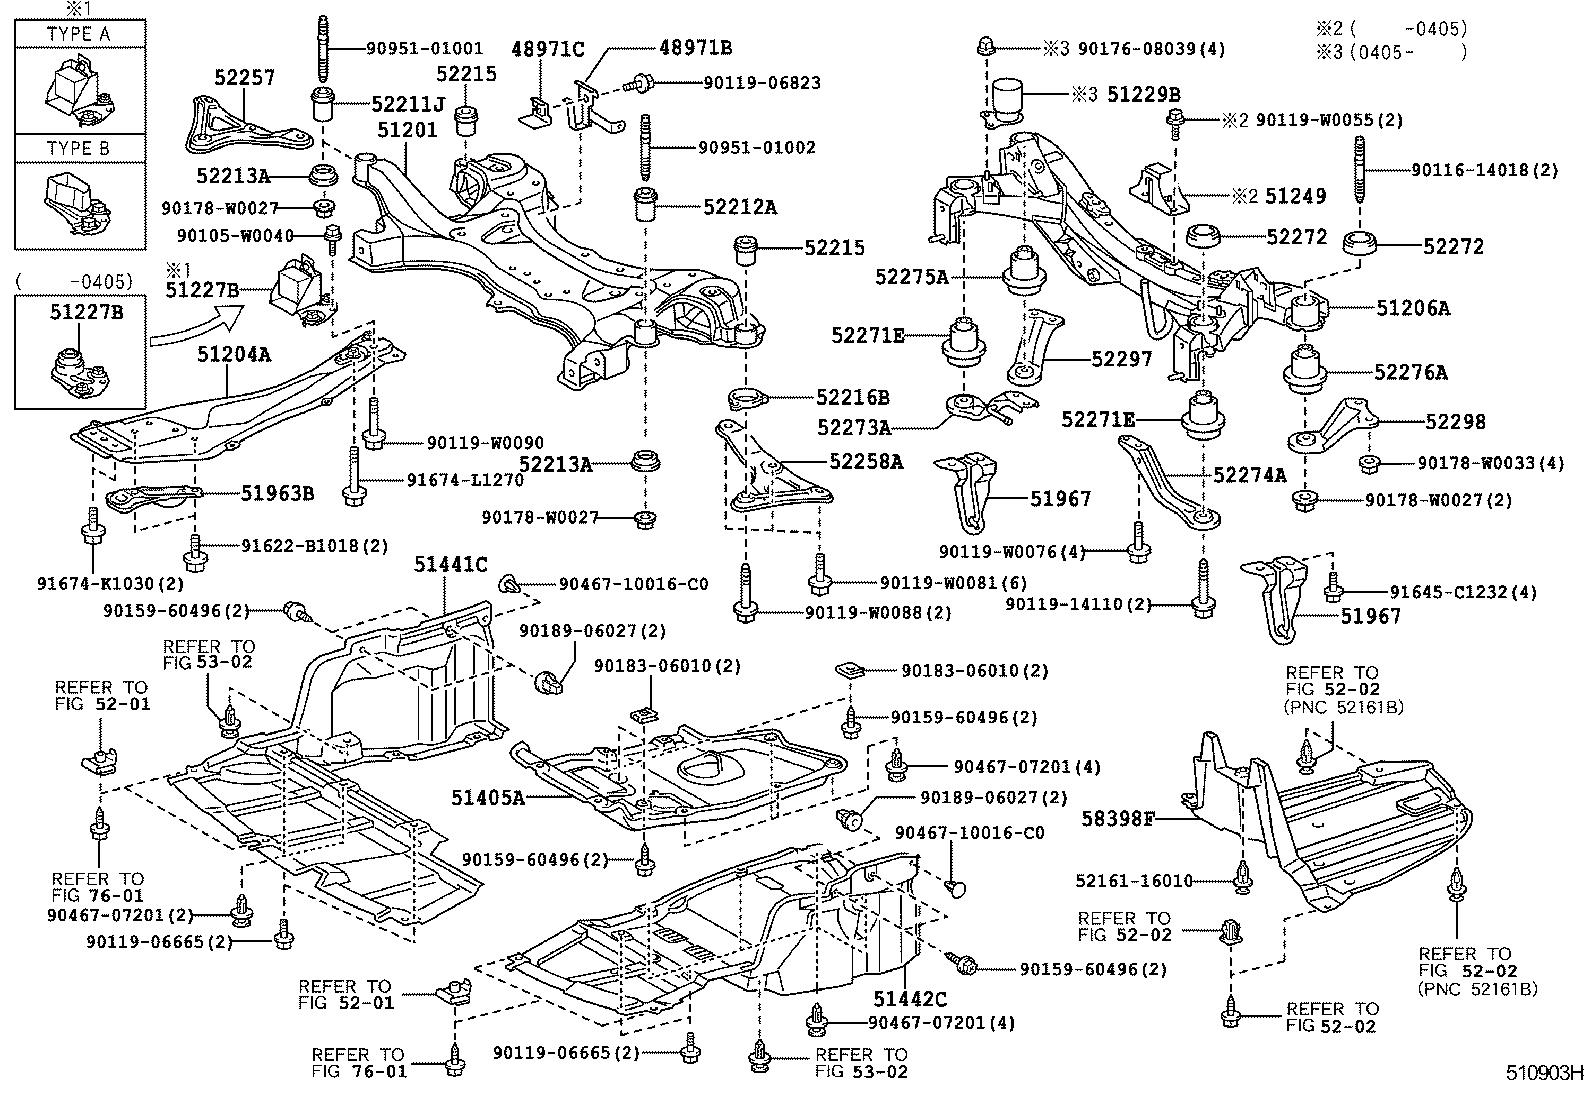 Toyota Corolla Body Parts Diagram Kia Rio Body Parts